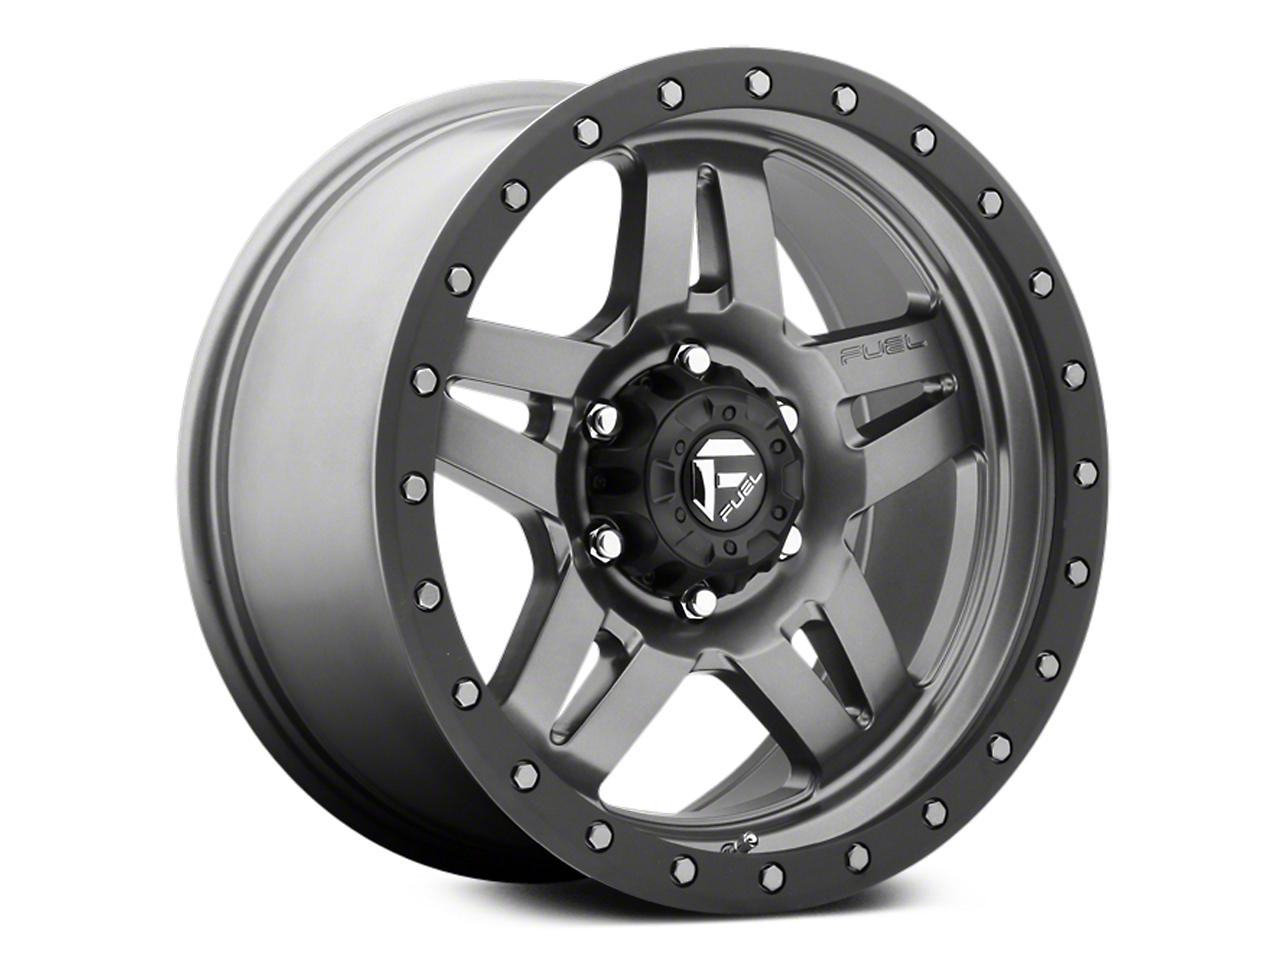 Fuel Wheels Anza Anthracite w/ Black Ring 6-Lug Wheel - 18x9 (07-18 Sierra 1500)